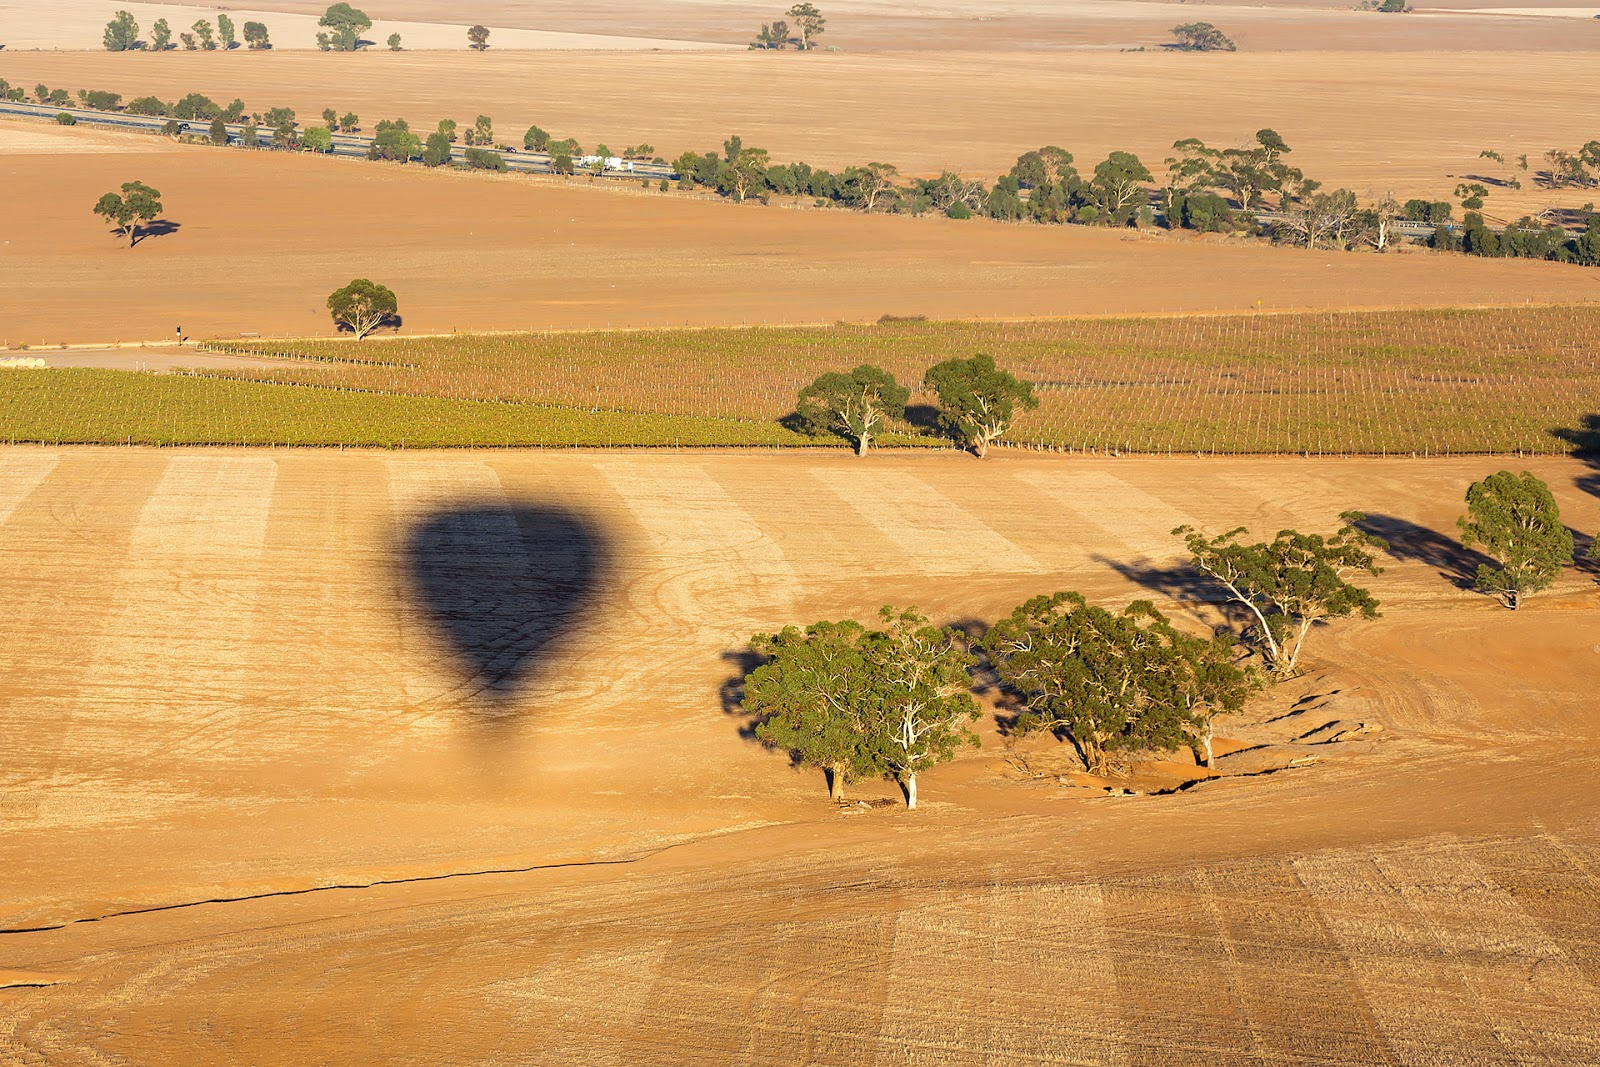 Australia - Balonem nad Doliną Barossa